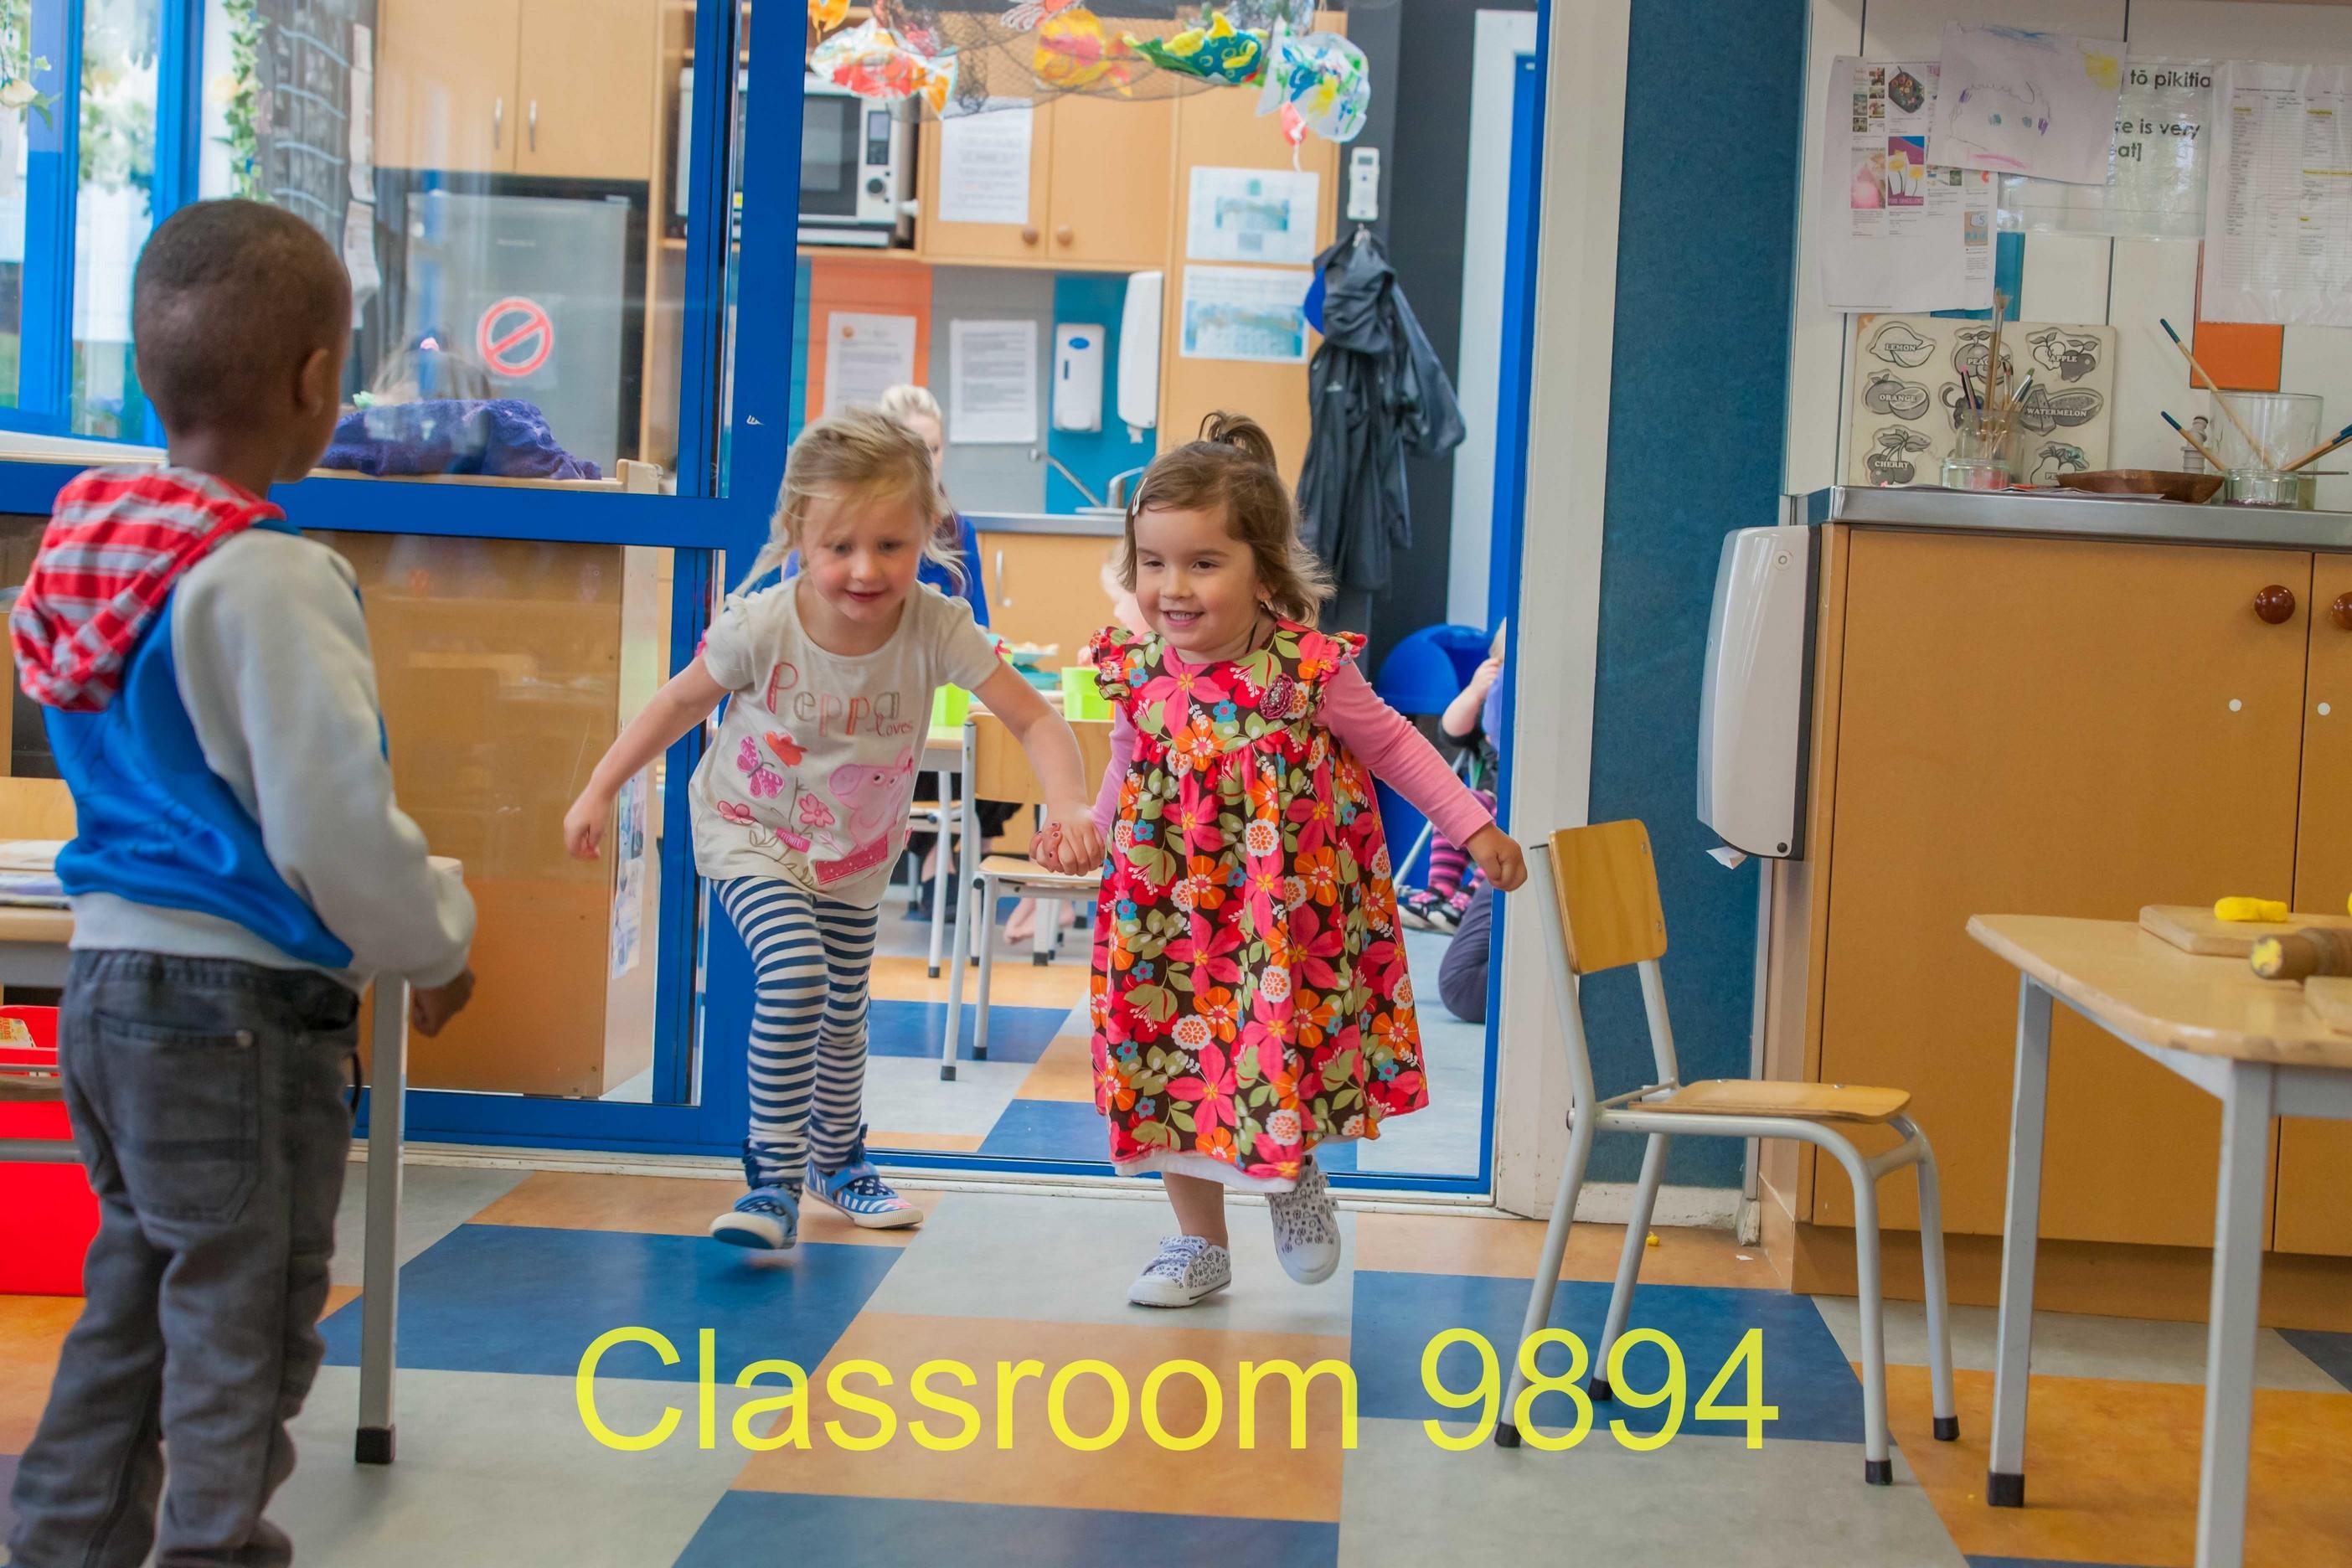 Classroom 9894